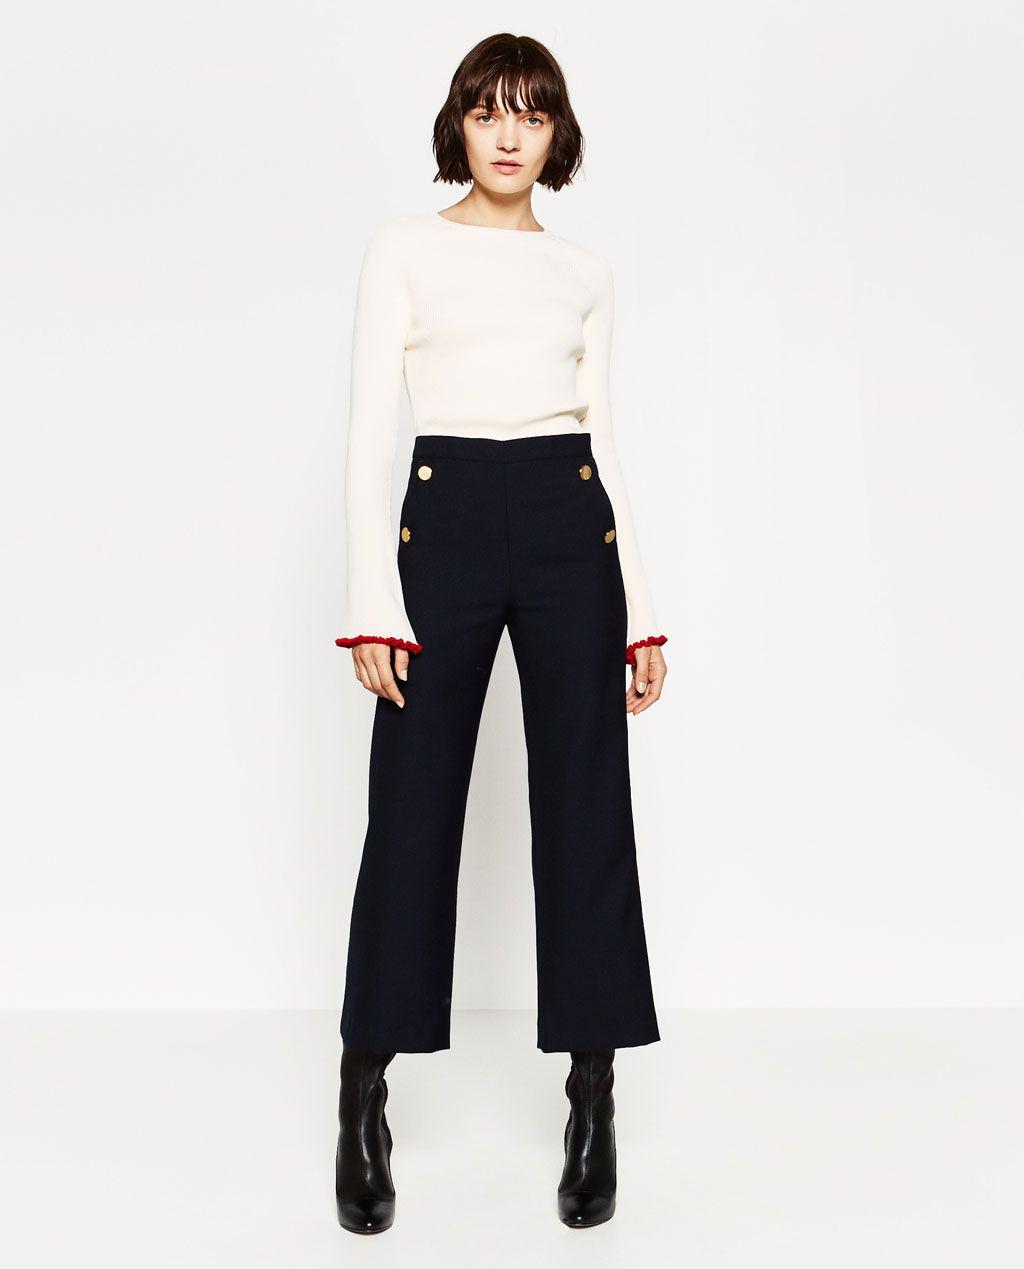 Zara Woman Gold Button Trousers Rebajas Mujer Ropa Moda